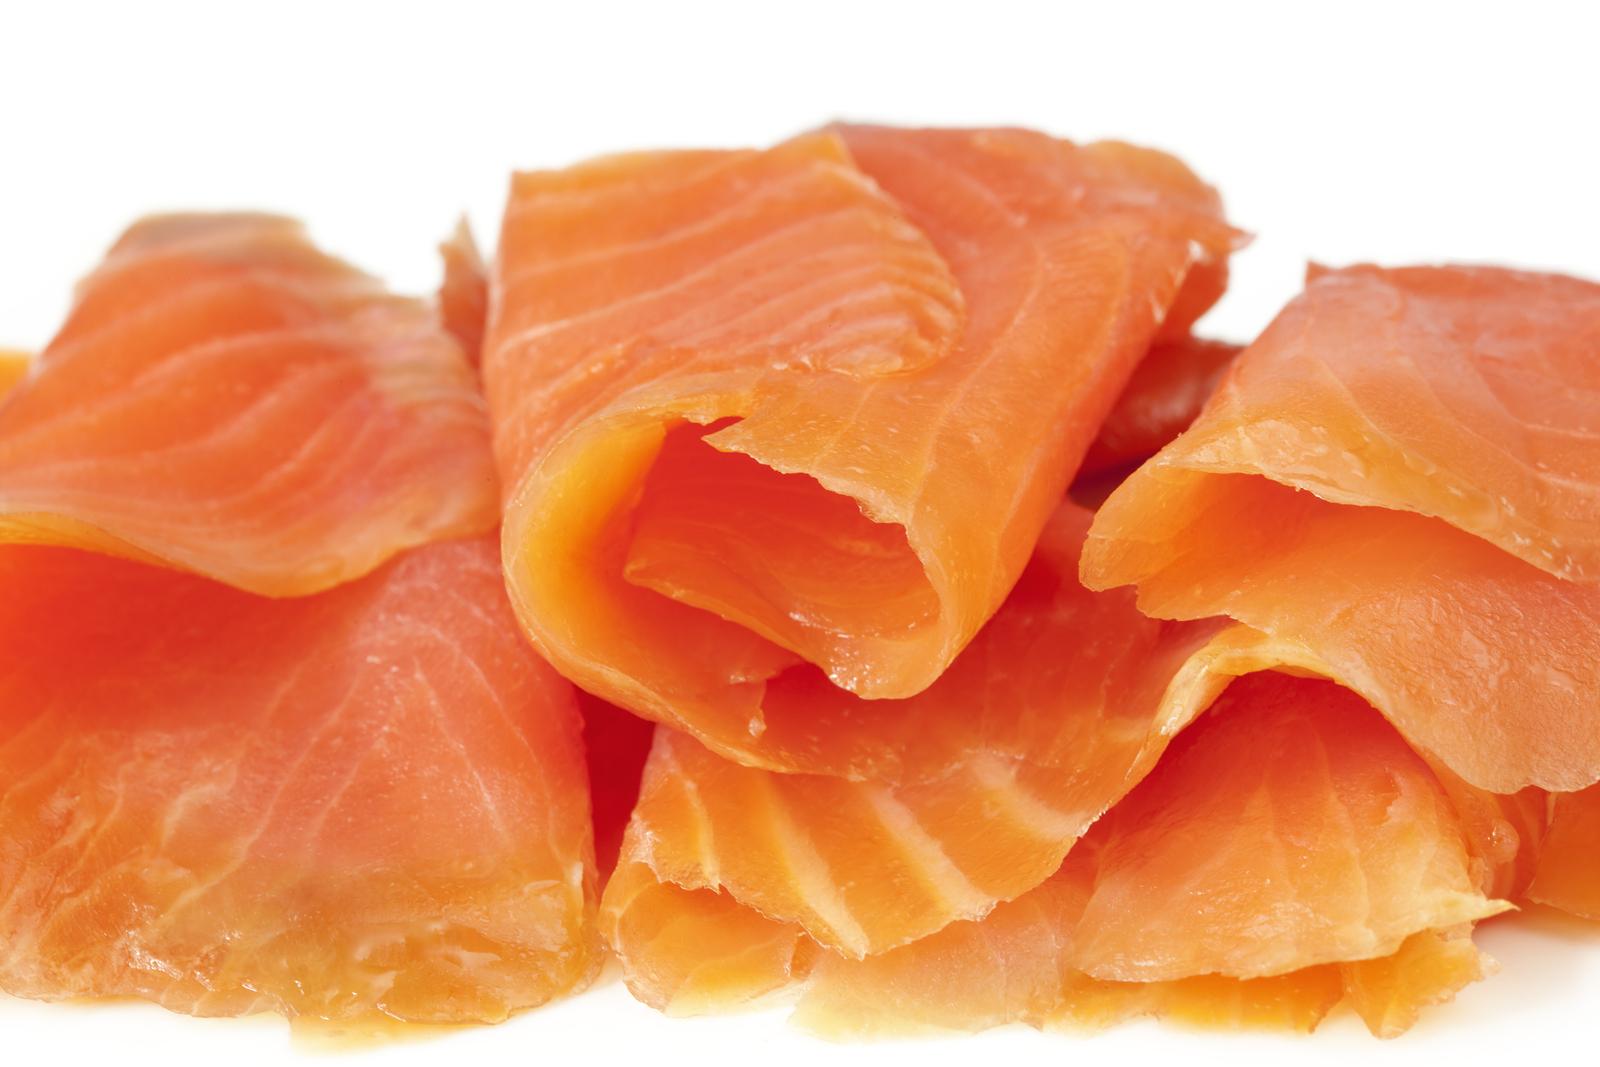 smoked salmon recalled supermarket news grapevine clipart border grape vine clip art images